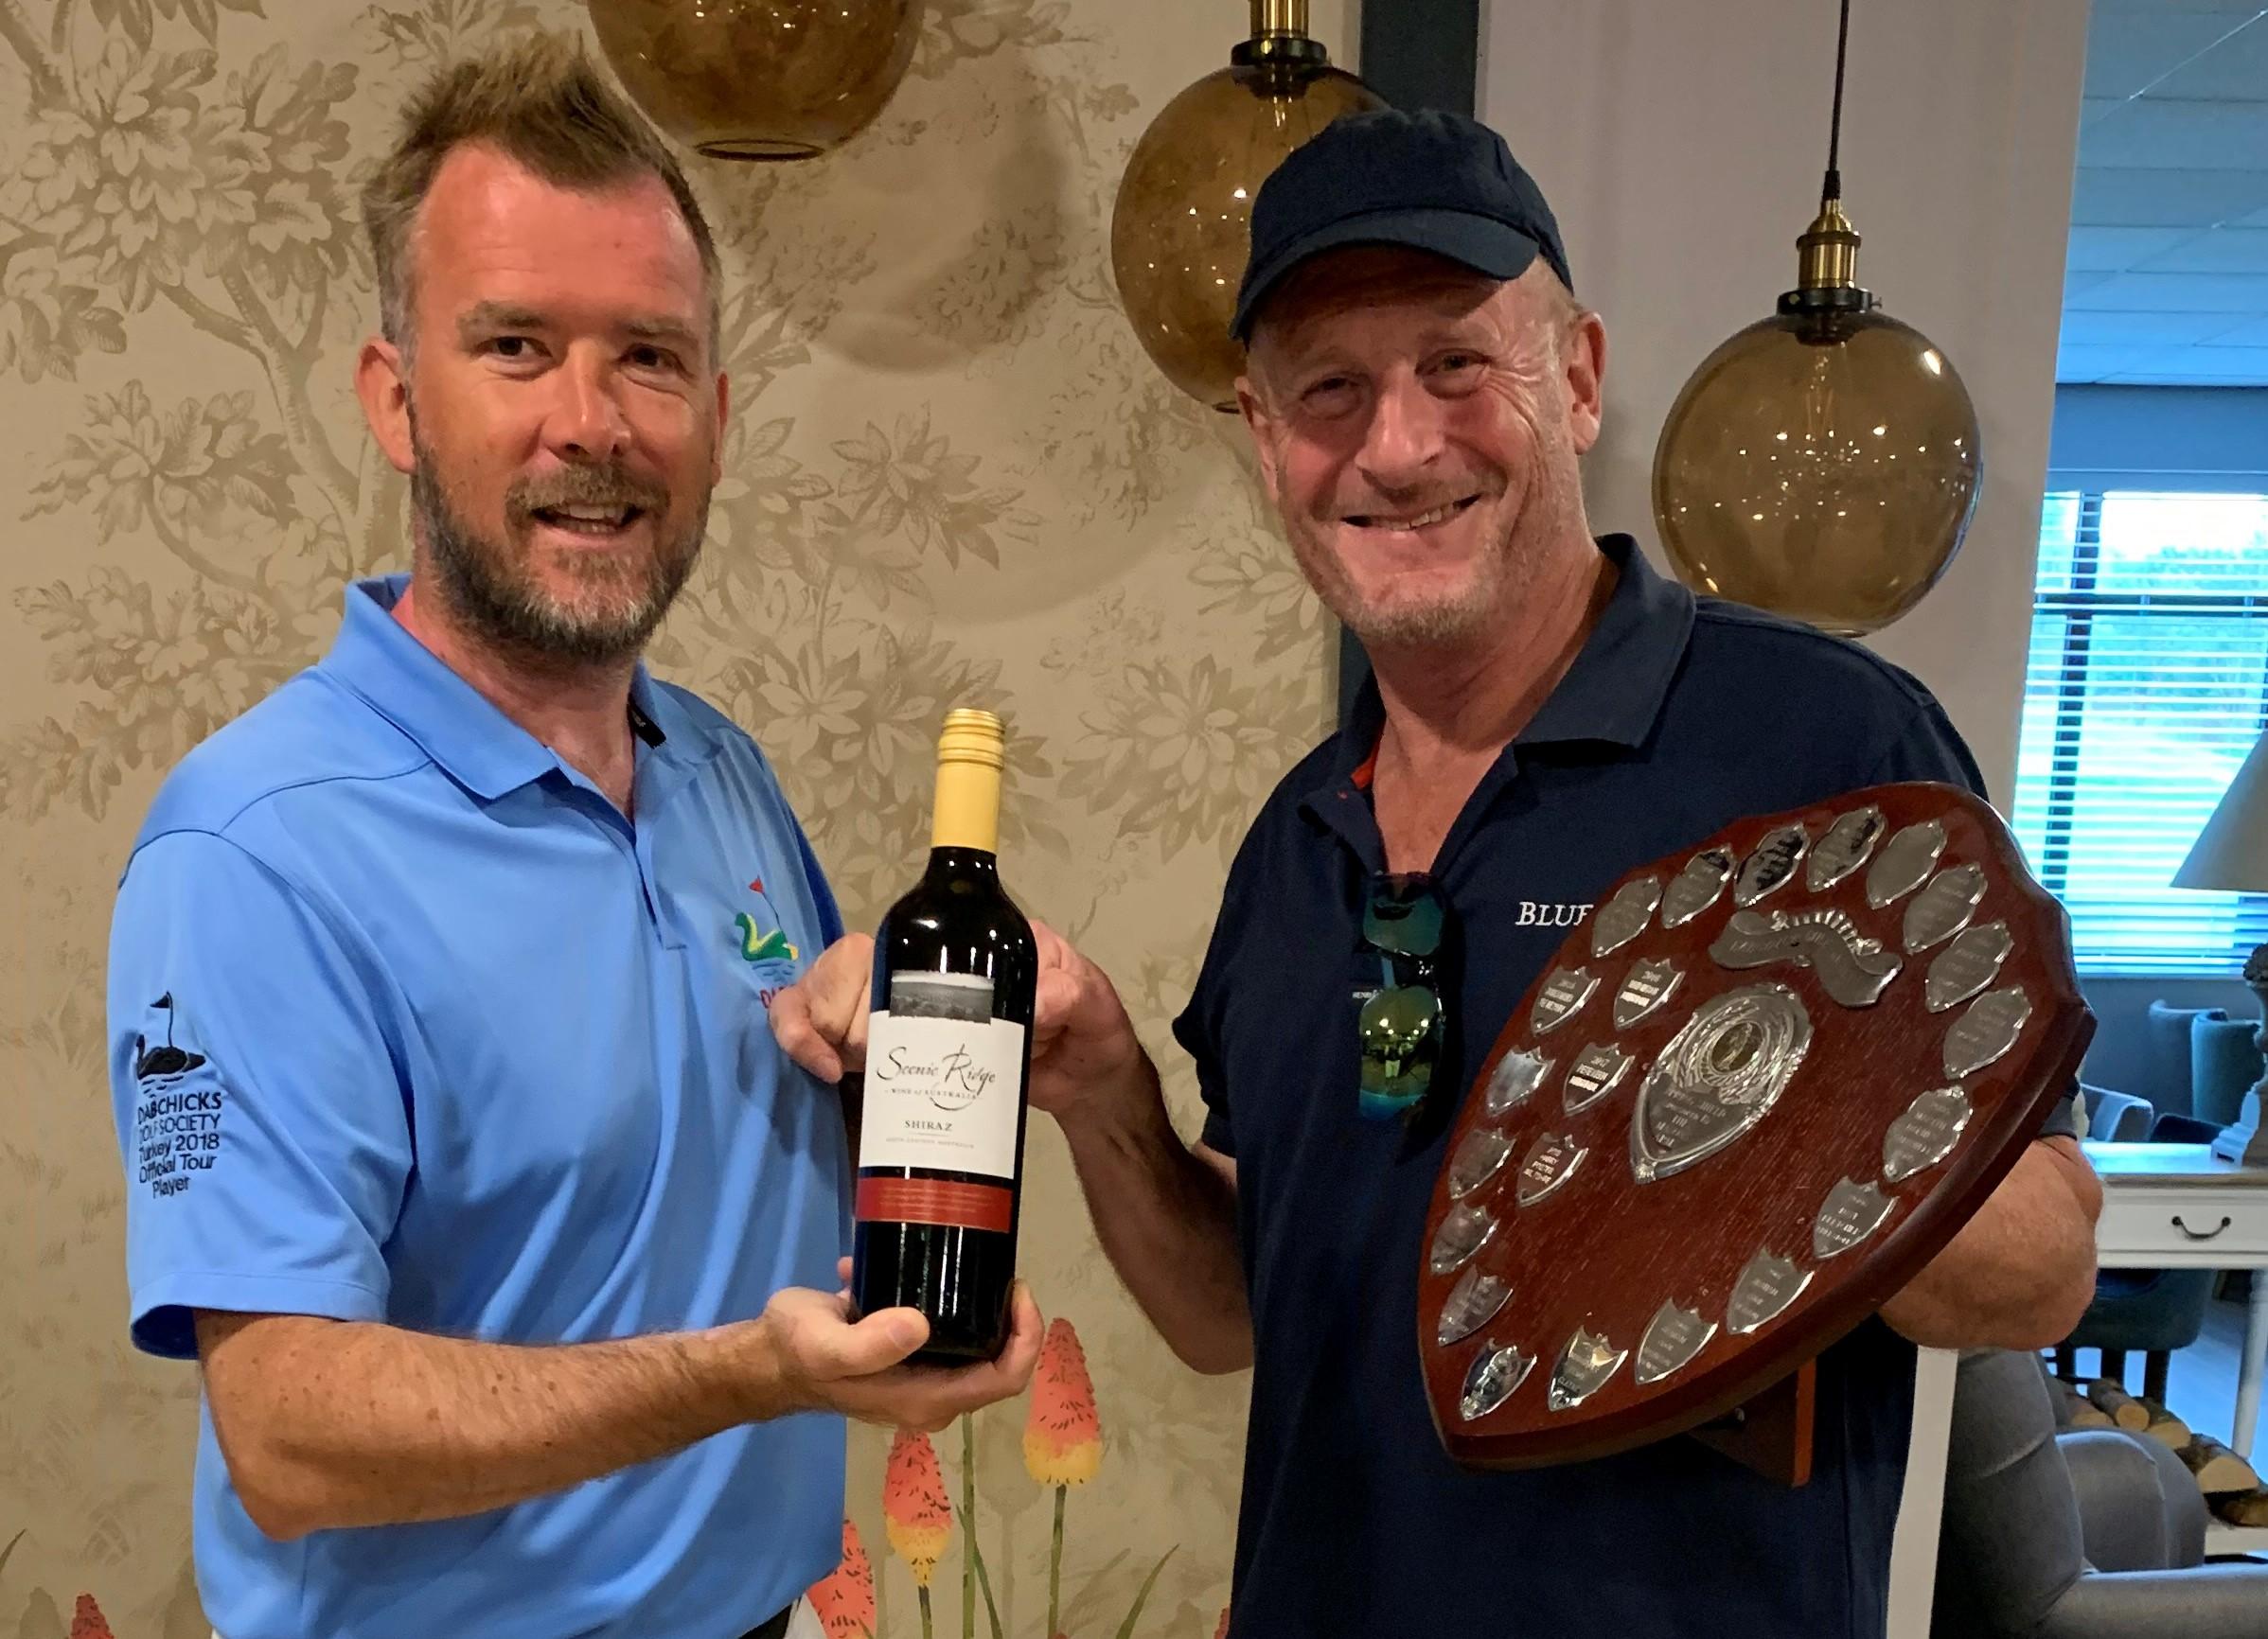 Simon Barrett, winner of Competition 1 of the Dabchick Goling Year